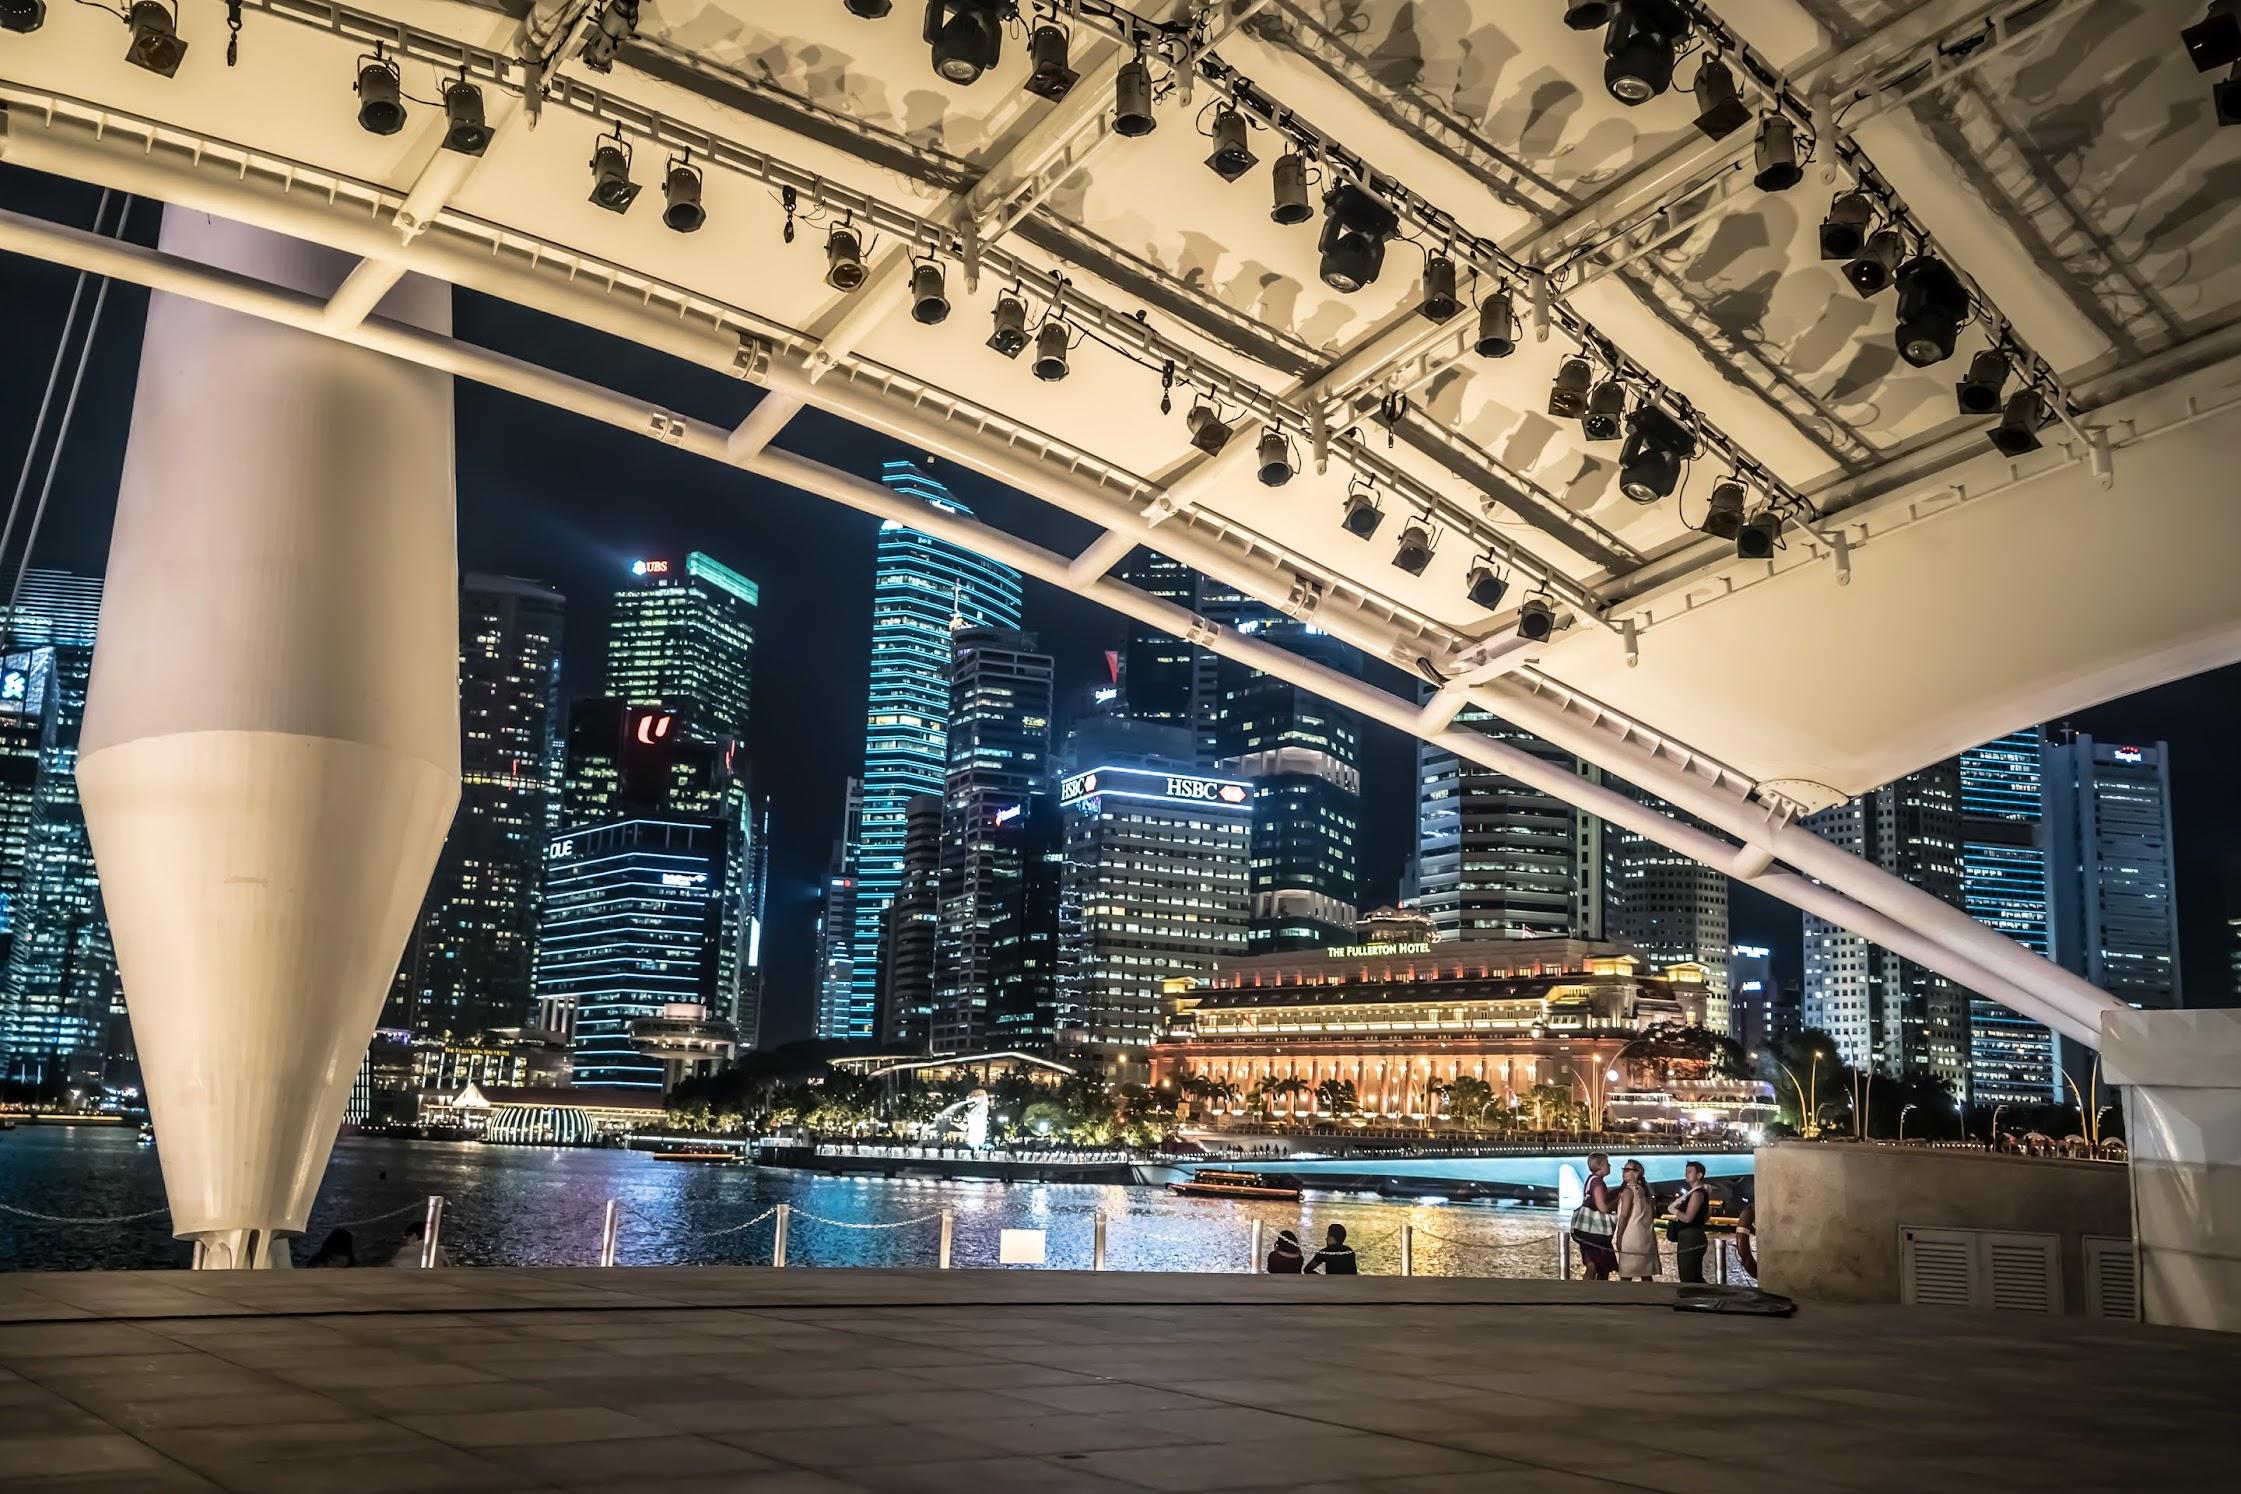 Singapore Esplanade evening3